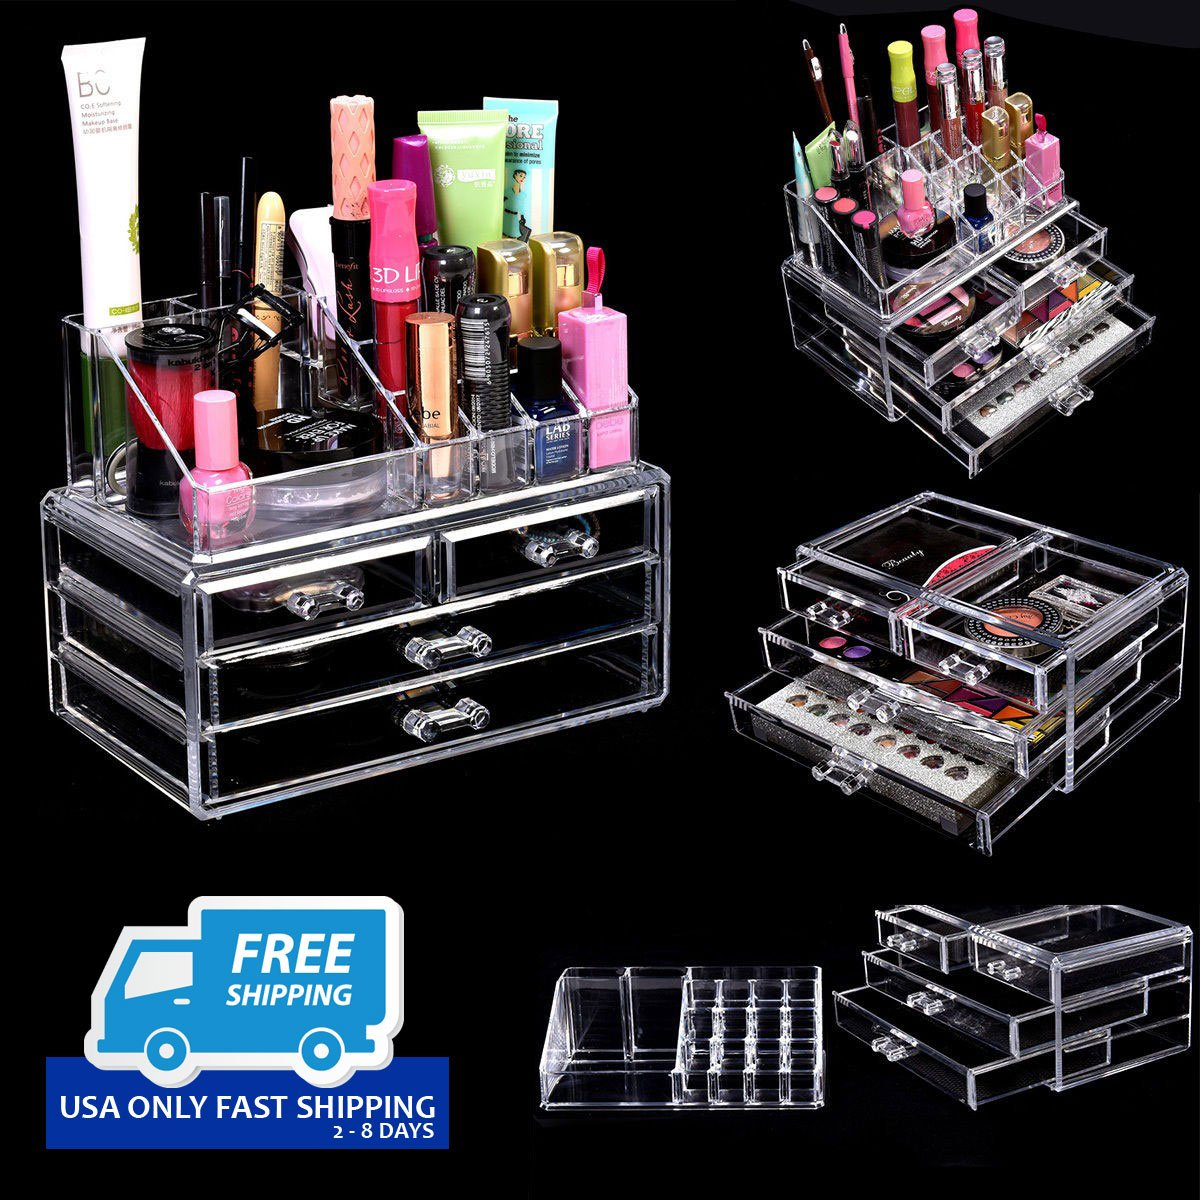 Acrylic Makeup Cosmetic Organizer 4 Drawers Jewelry Storage Display Holder  Box